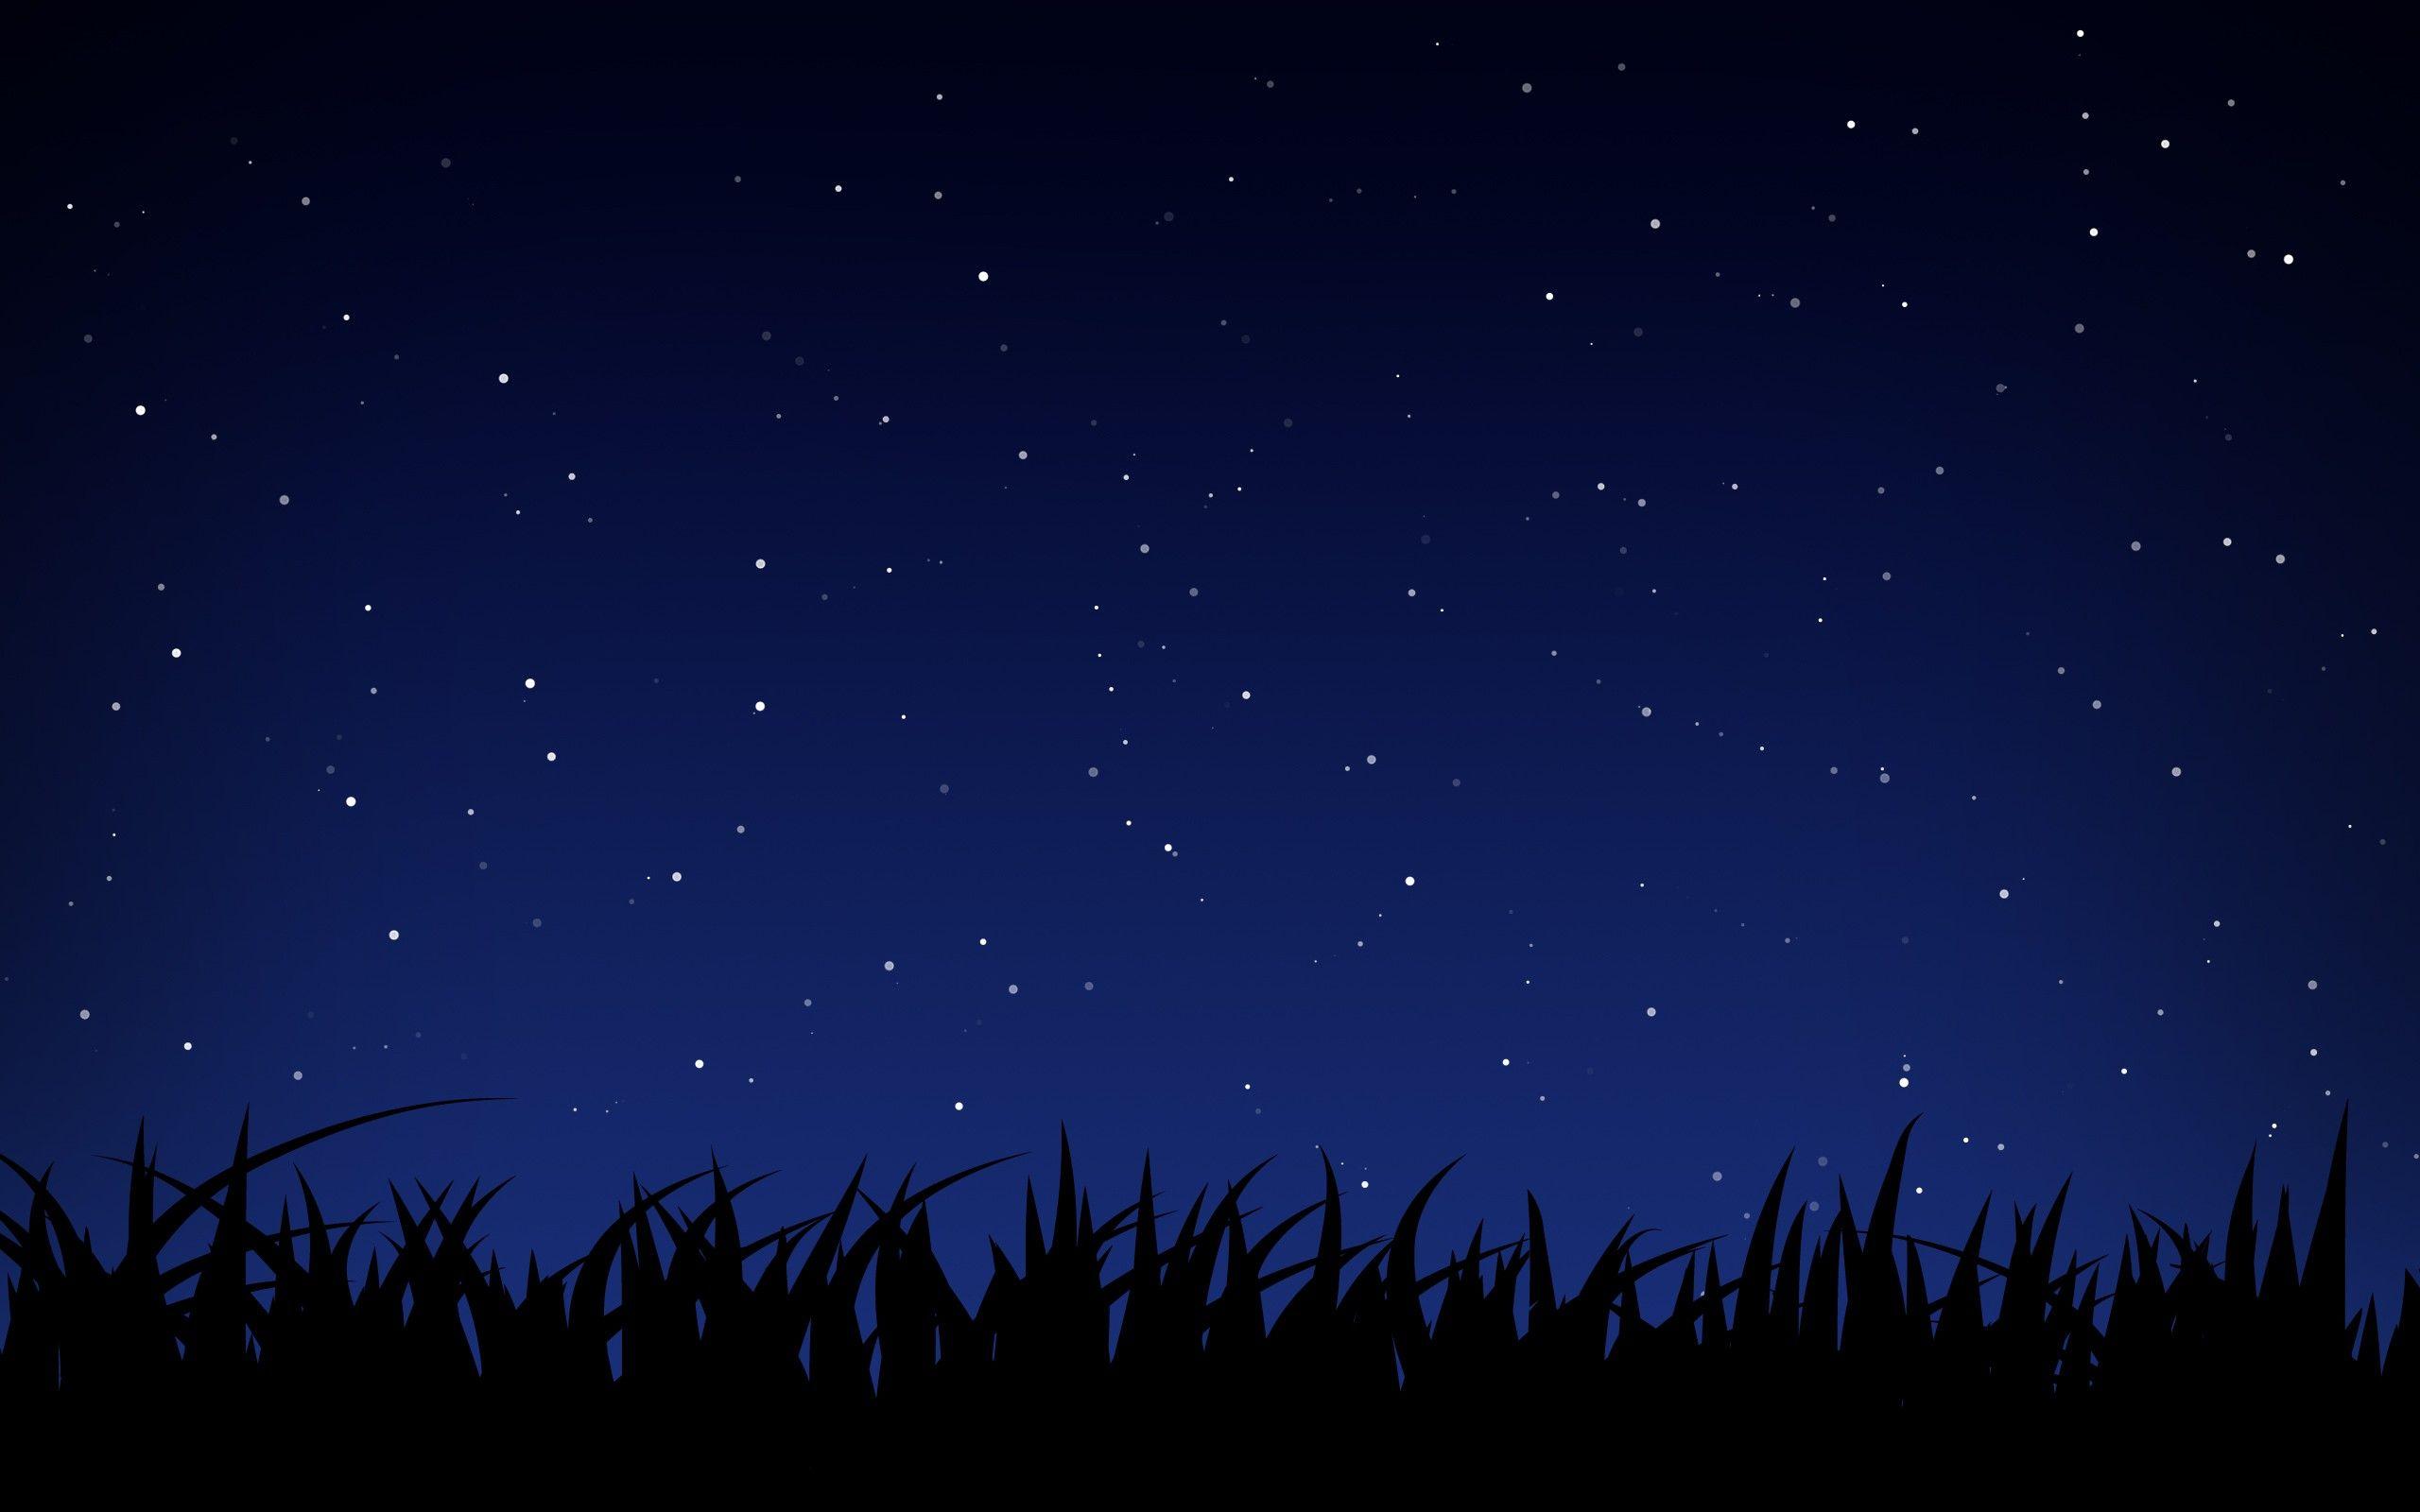 christmas night sky clipart - photo #12